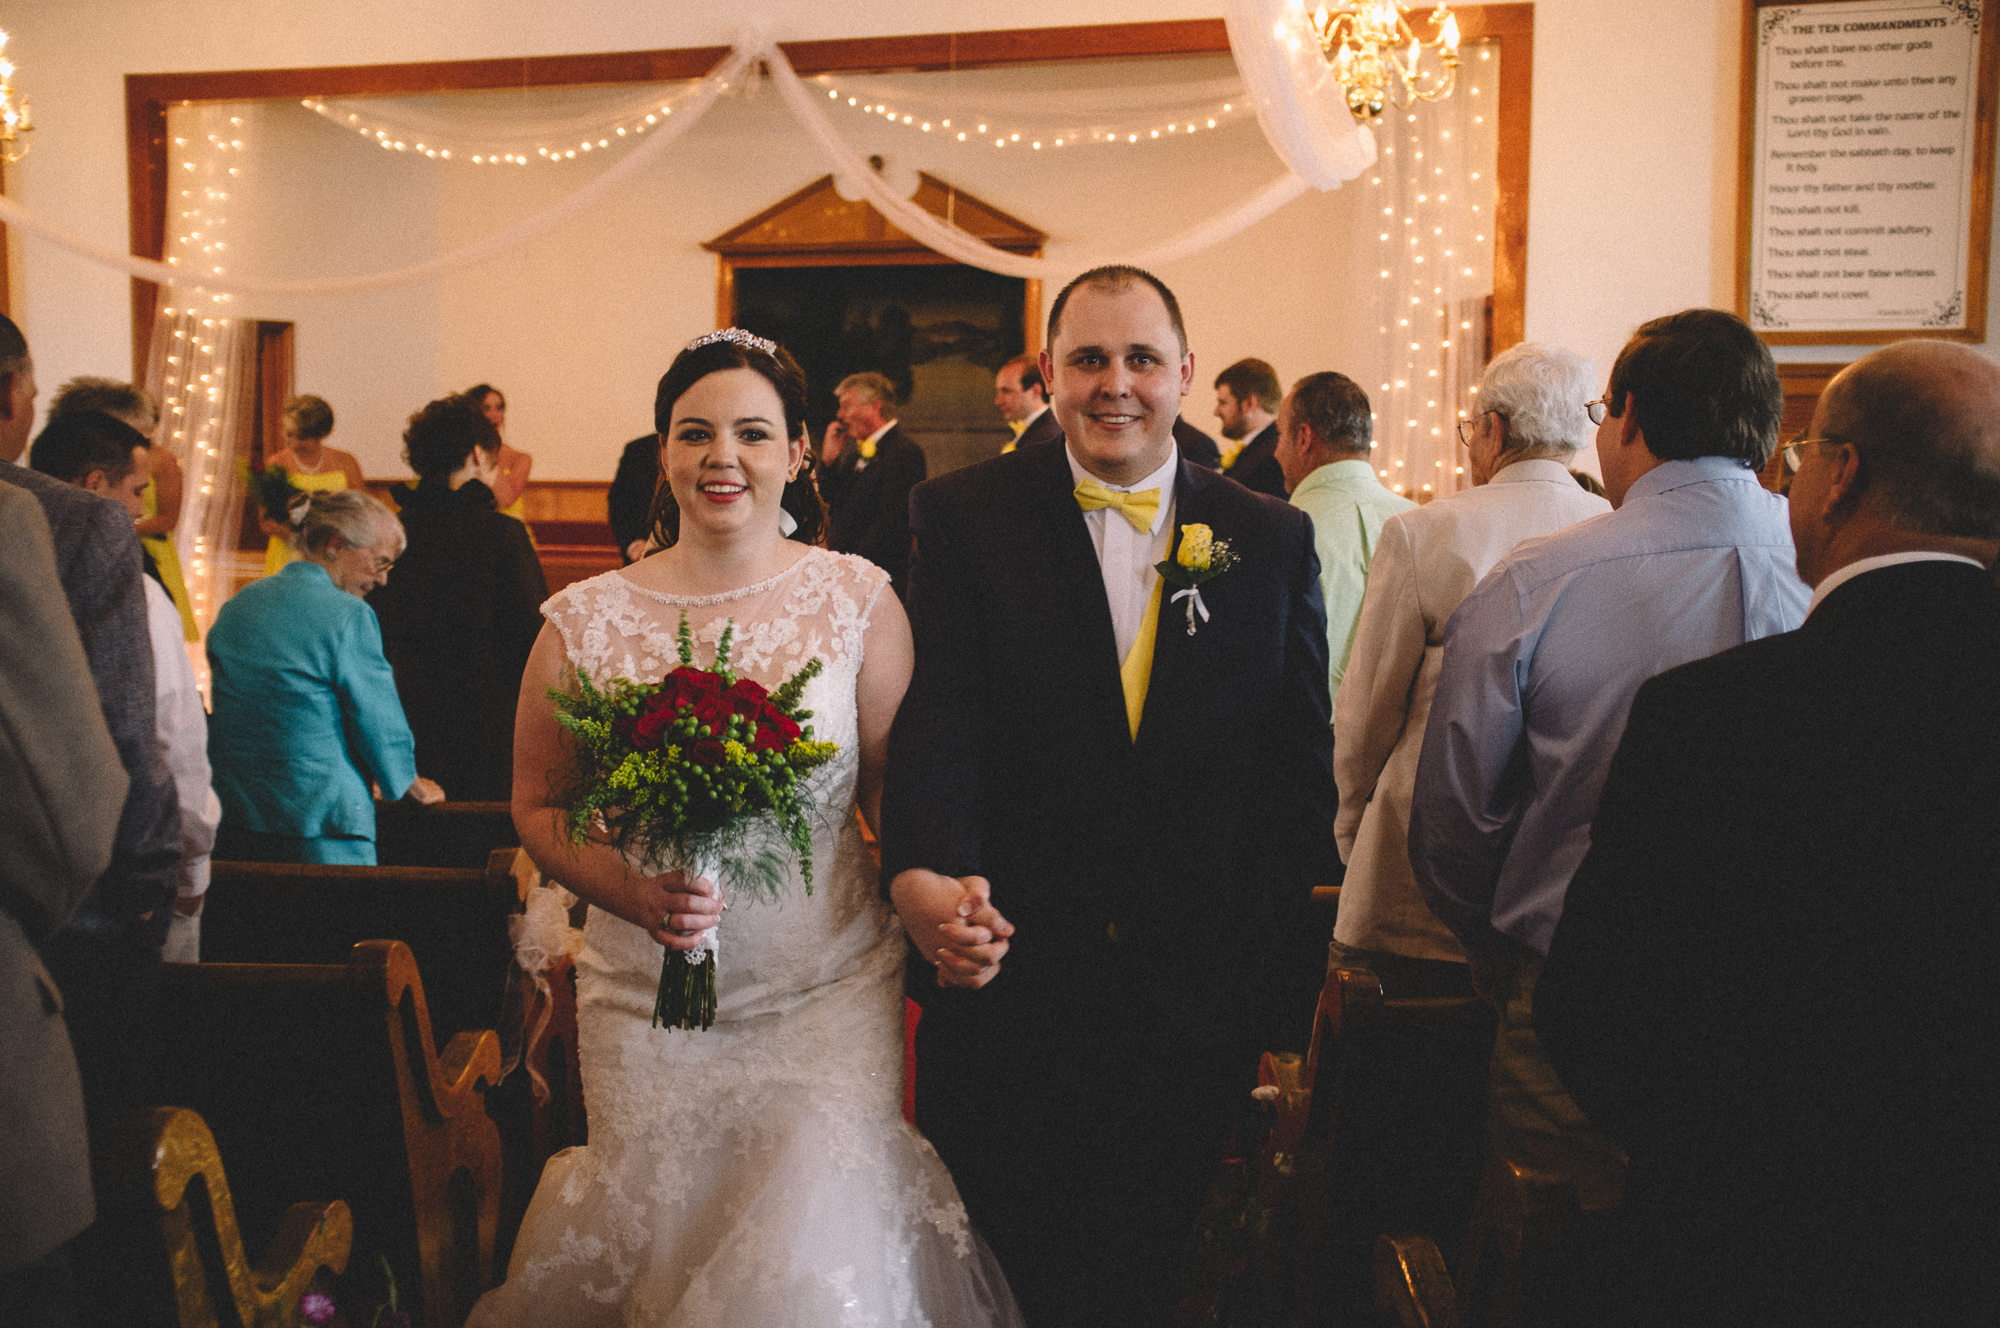 Emily-Shay-wedding-blog-18.jpg